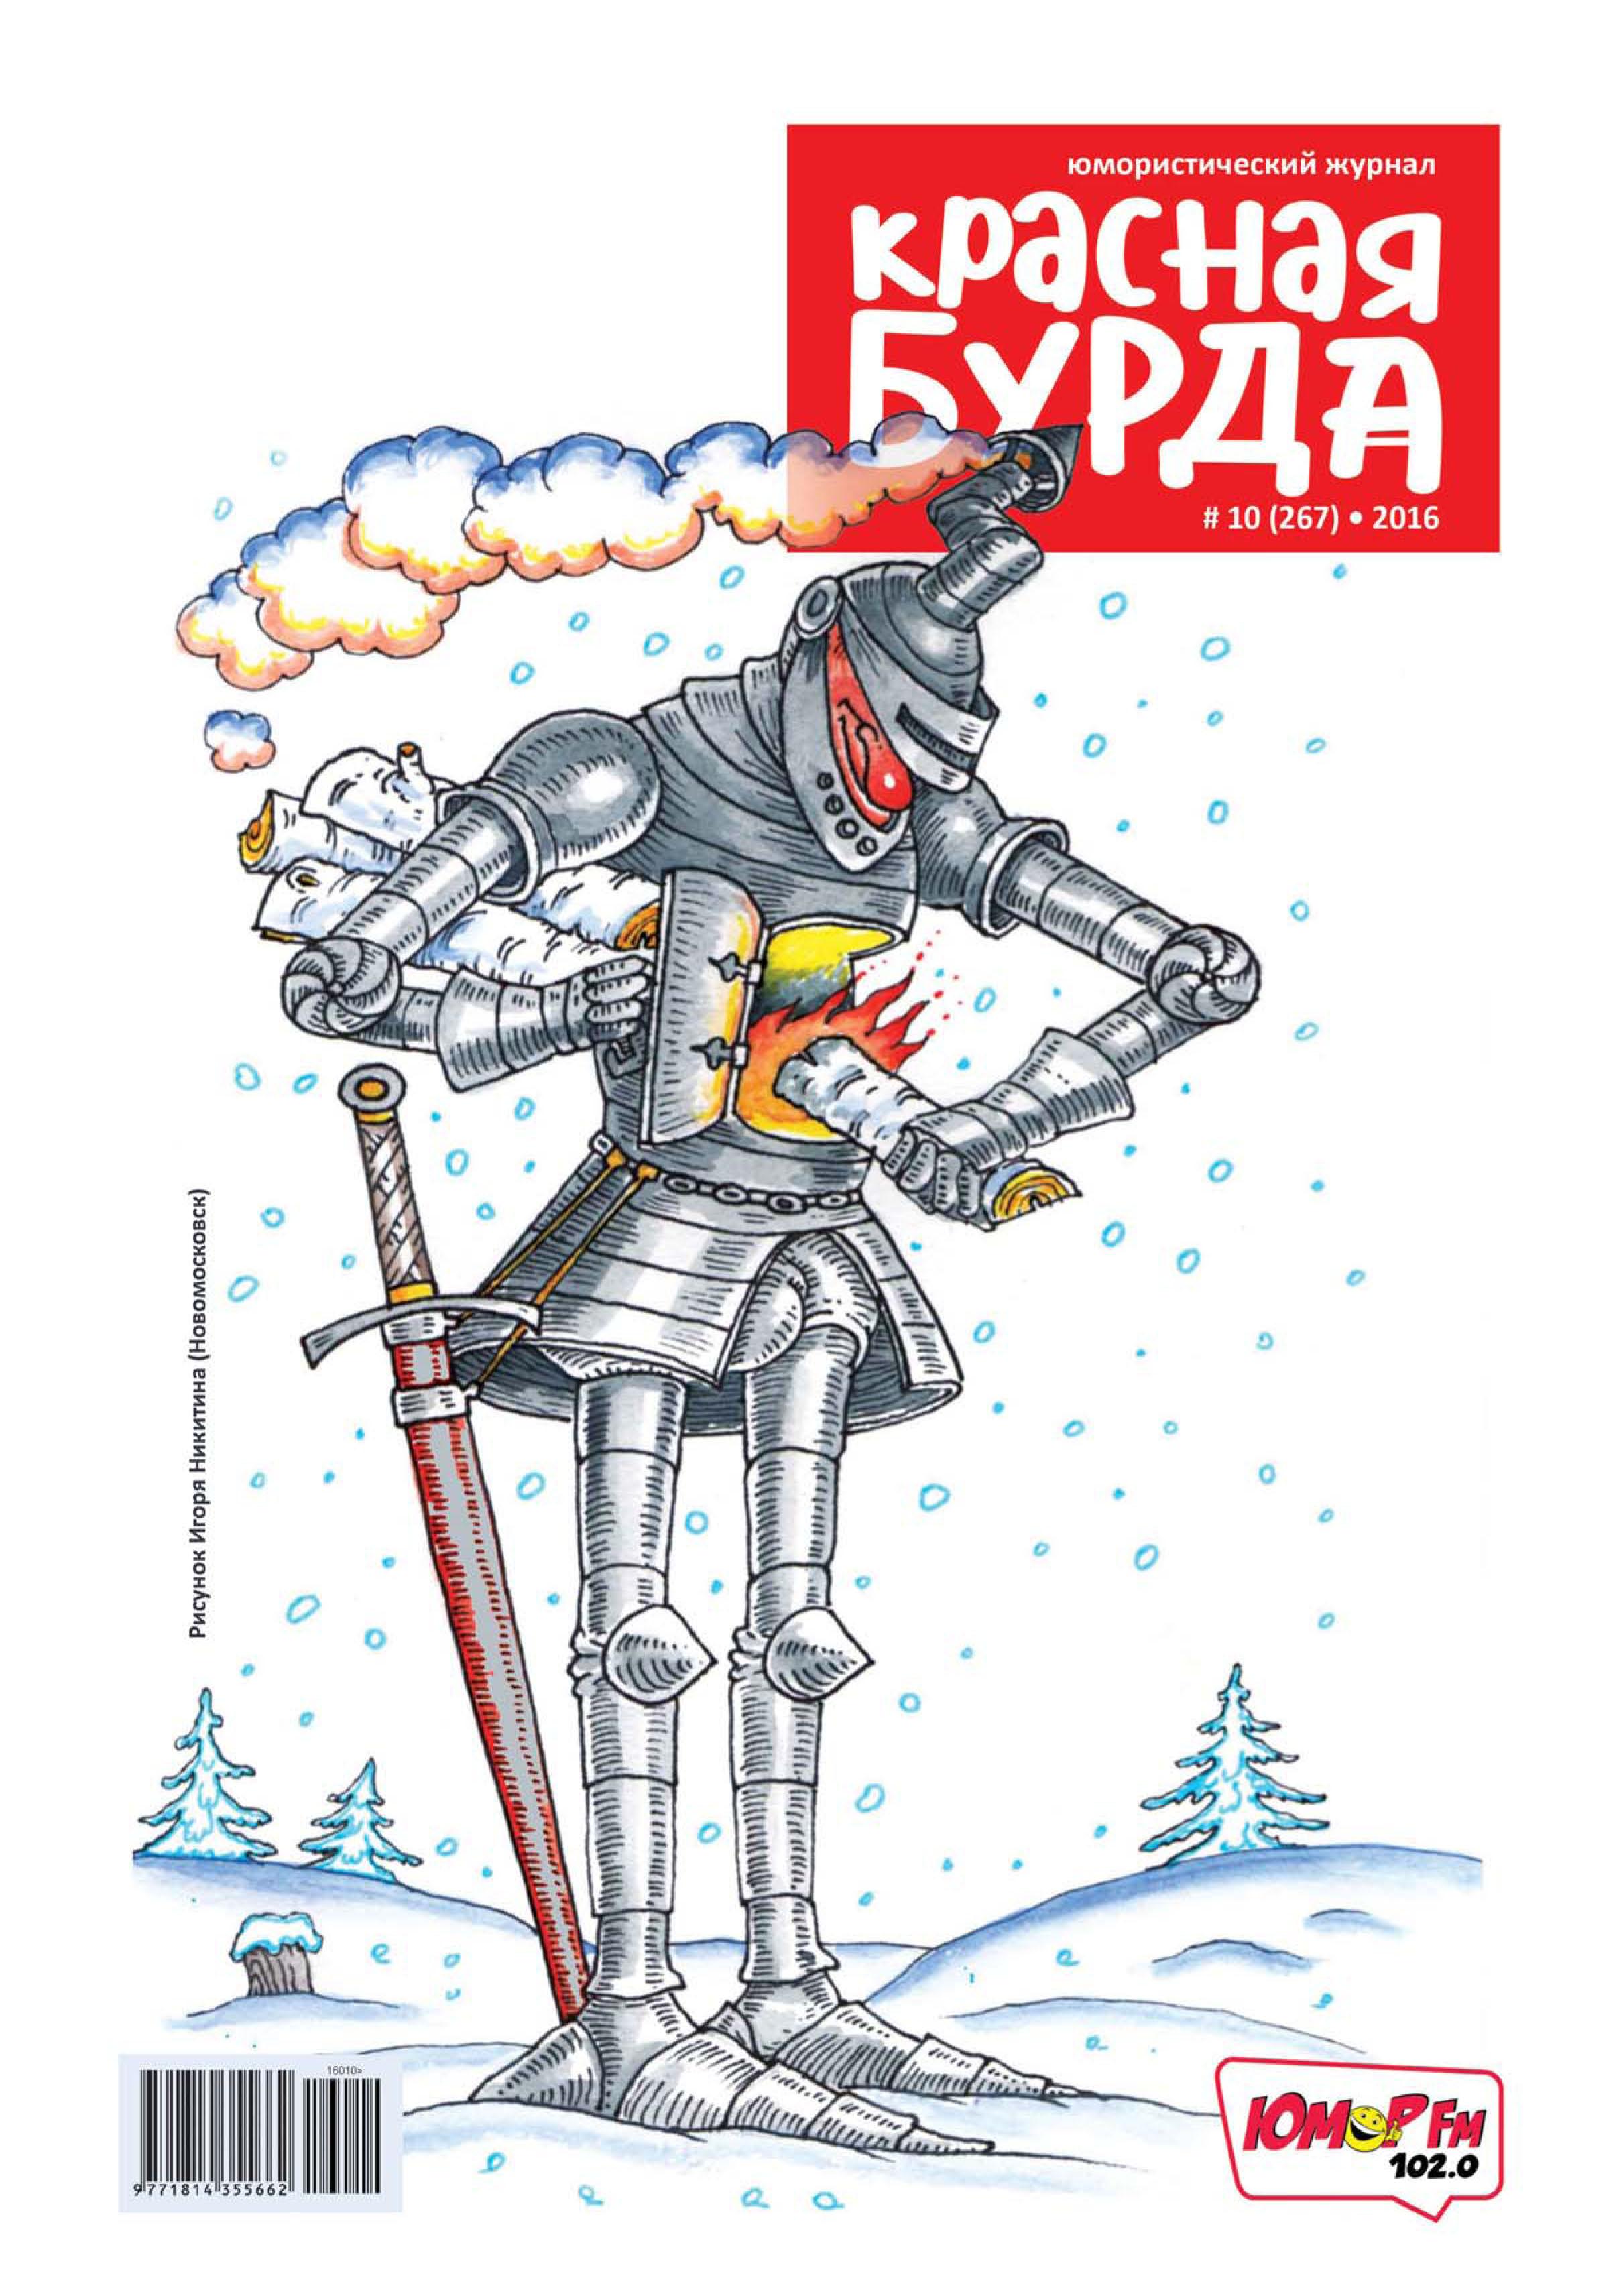 Красная бурда. Юмористический журнал. №10/2016